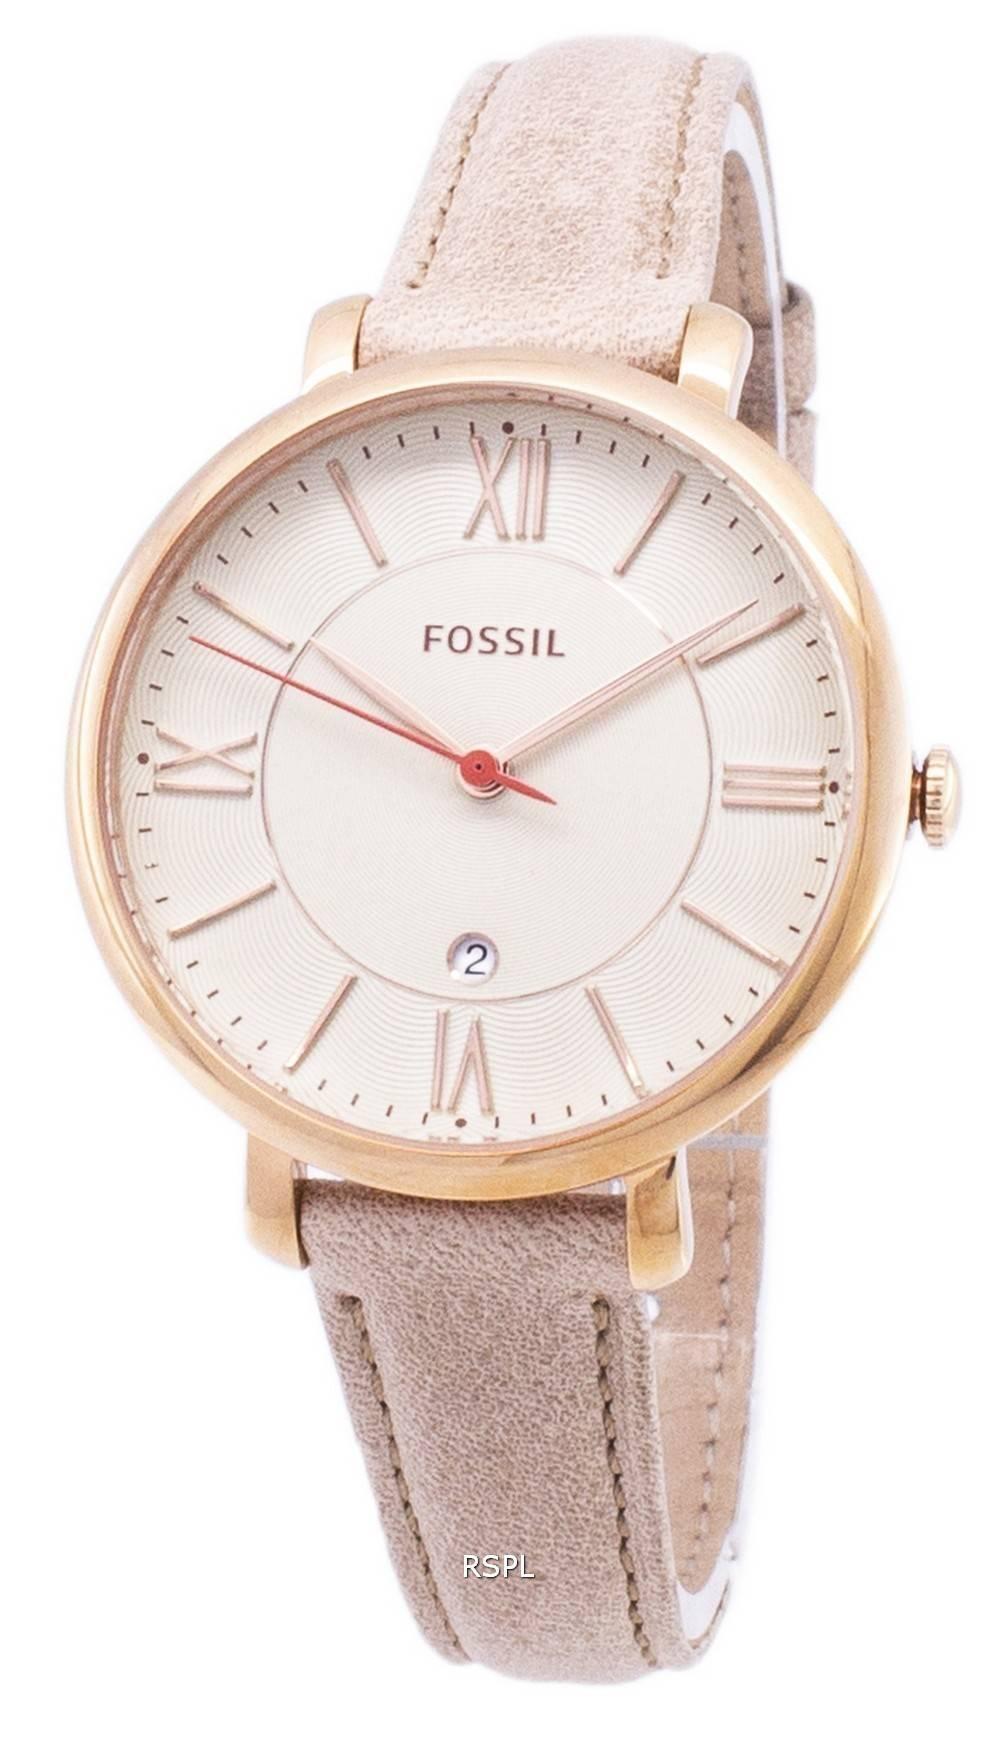 Bracelet Fossil En Blanc Montre Jacqueline Camel Cadran Es3487 Cuir XuOZPwkTi